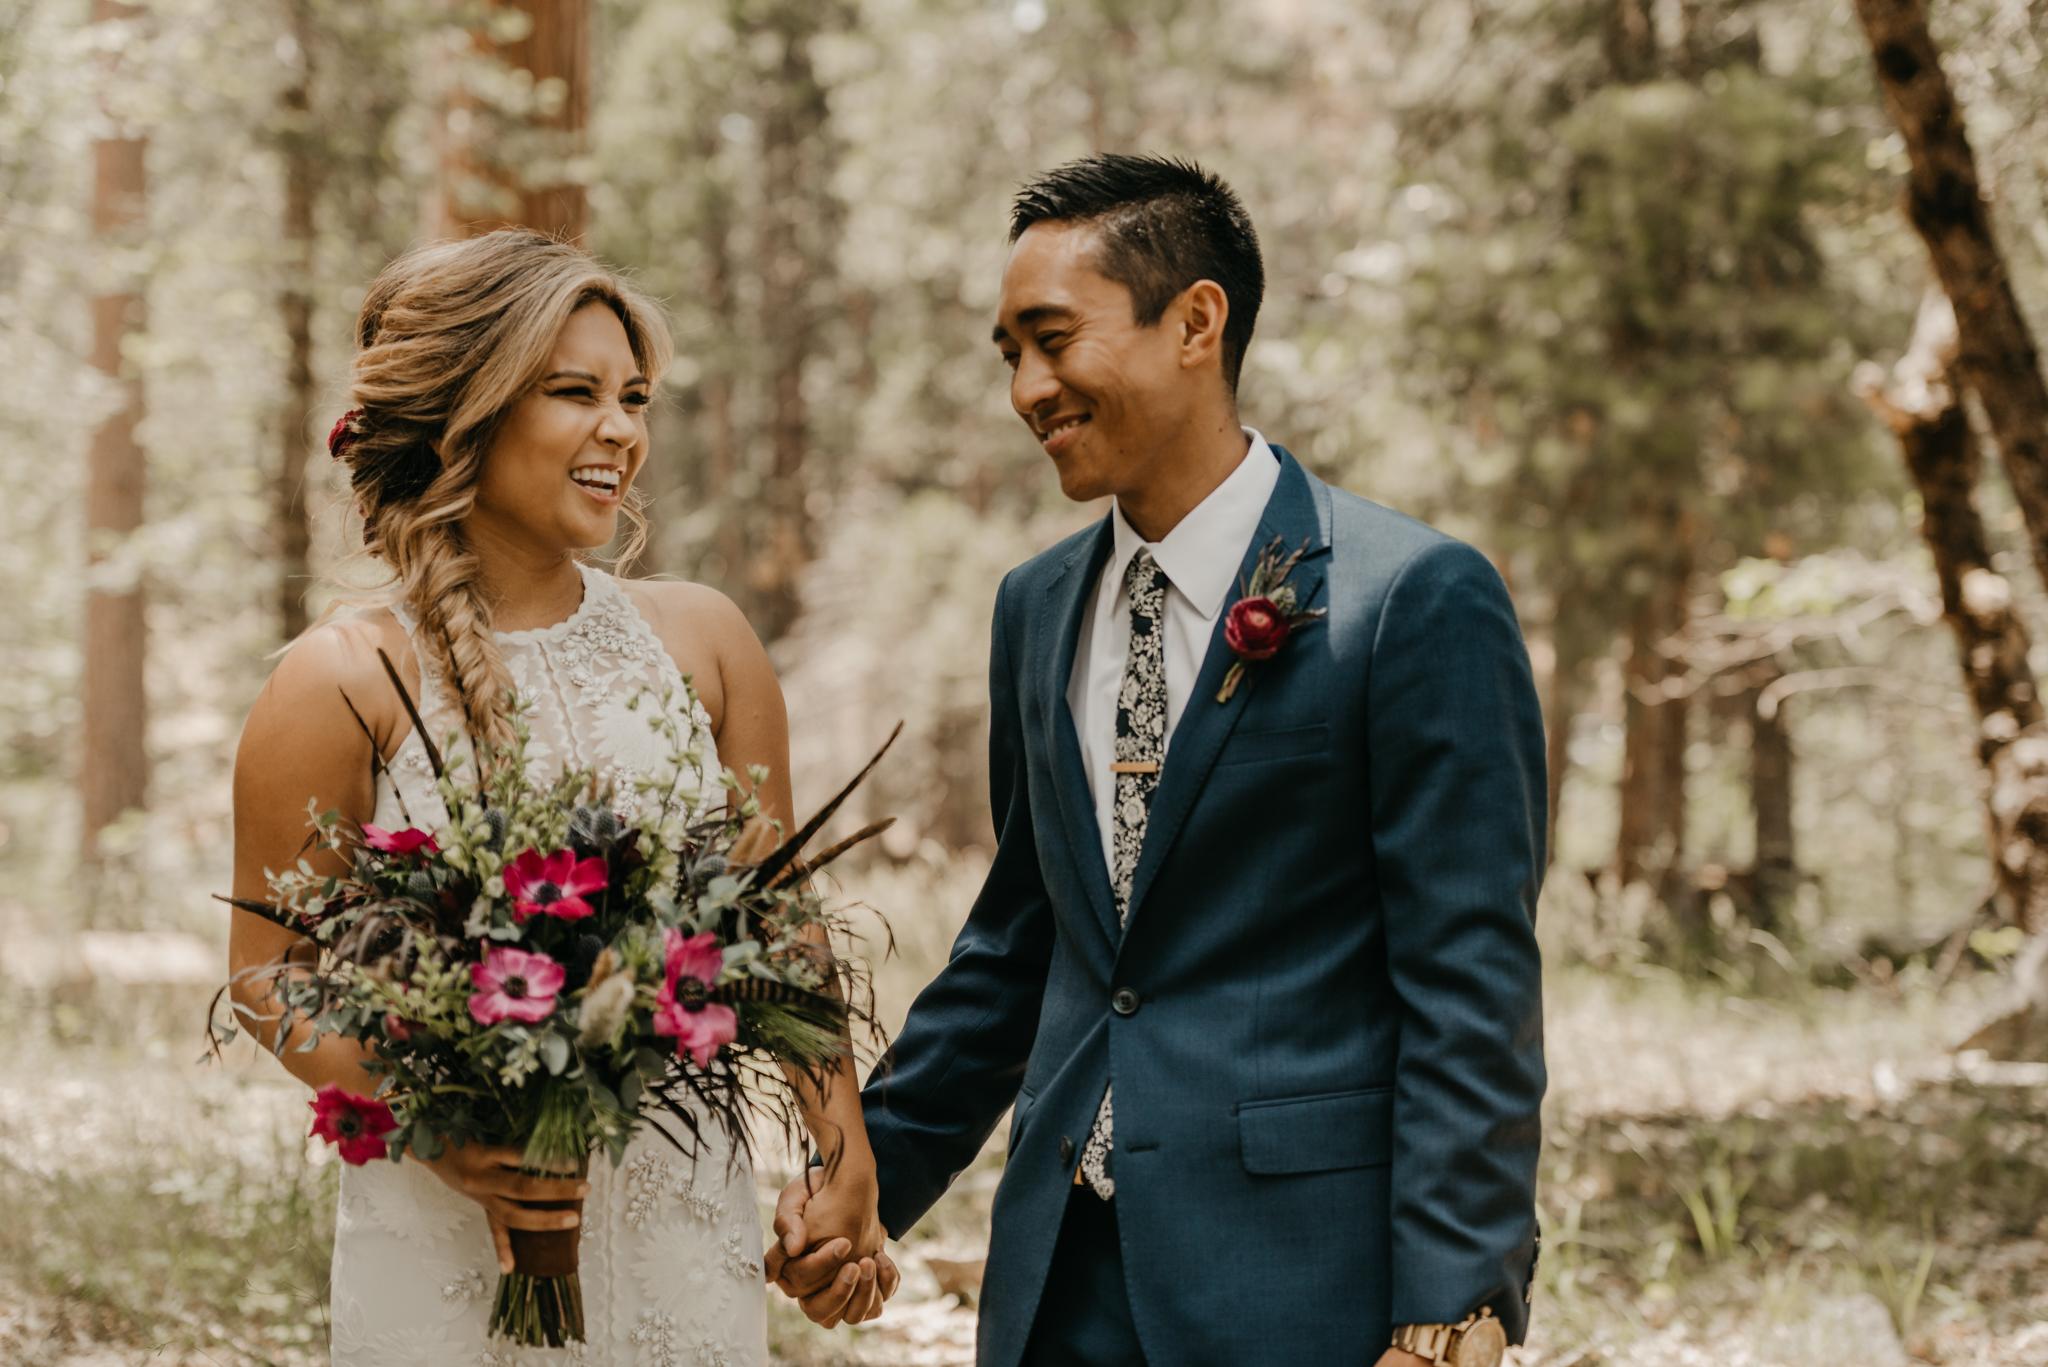 © Isaiah + Taylor Photography - Evergreen Lodge Destination Yoesmite Wedding - Los Angeles Wedding Photographer-078.jpg